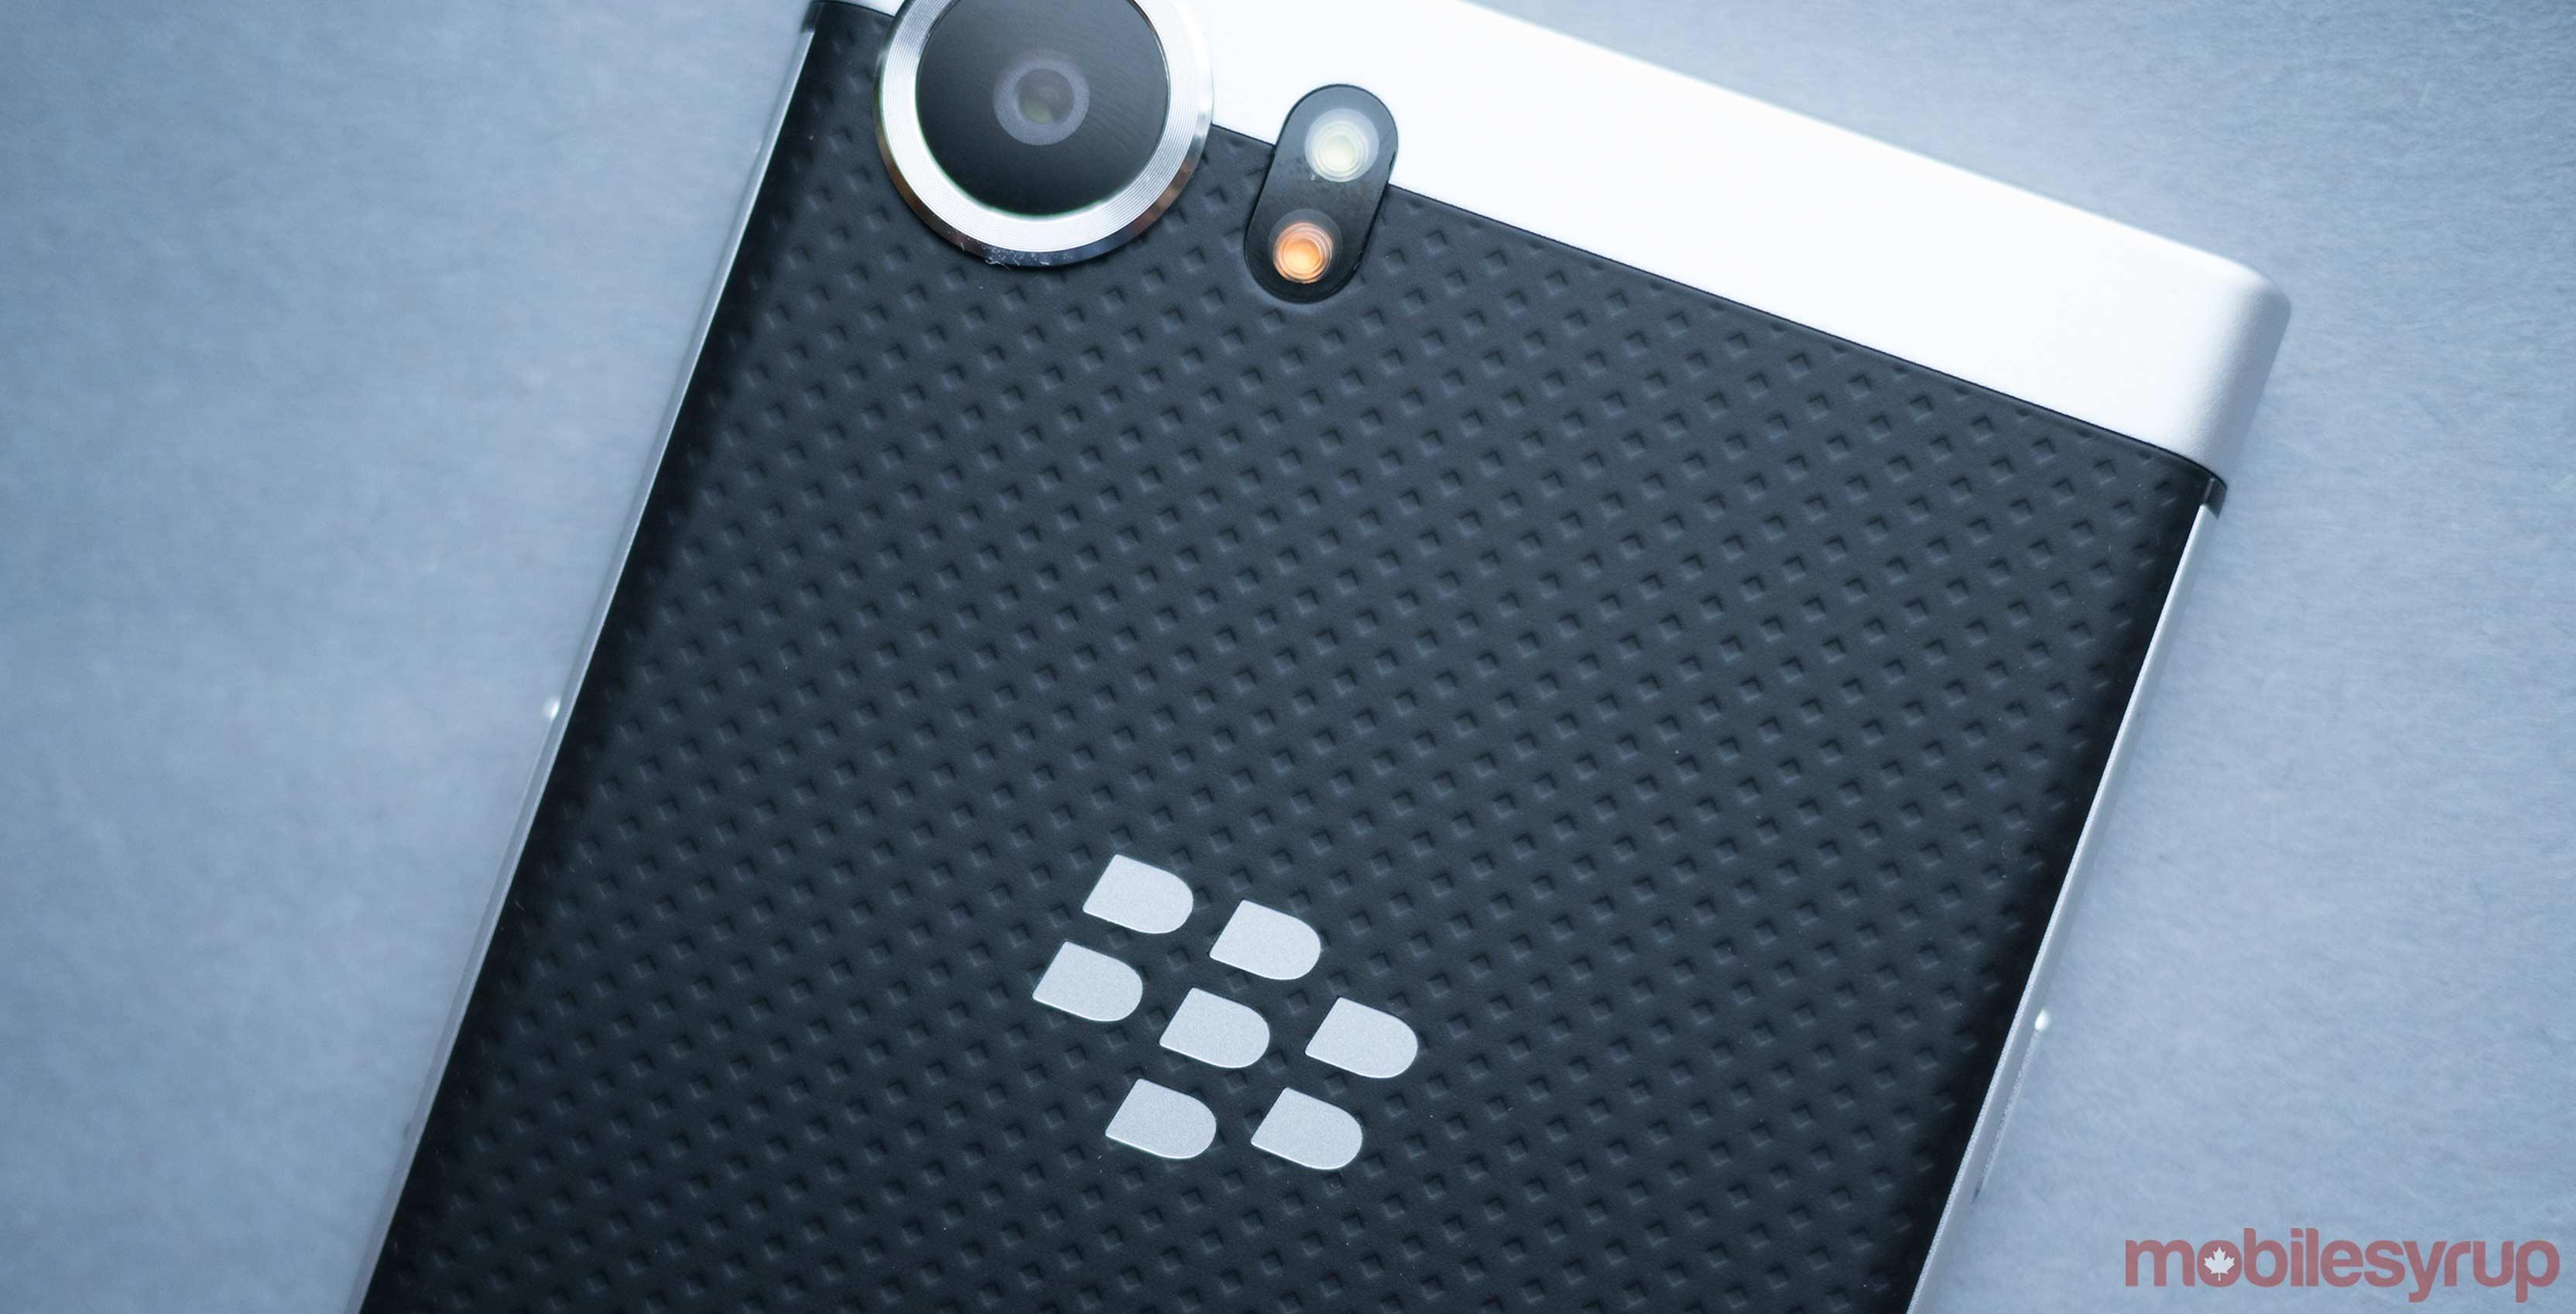 BlackBerry Key One back of phone